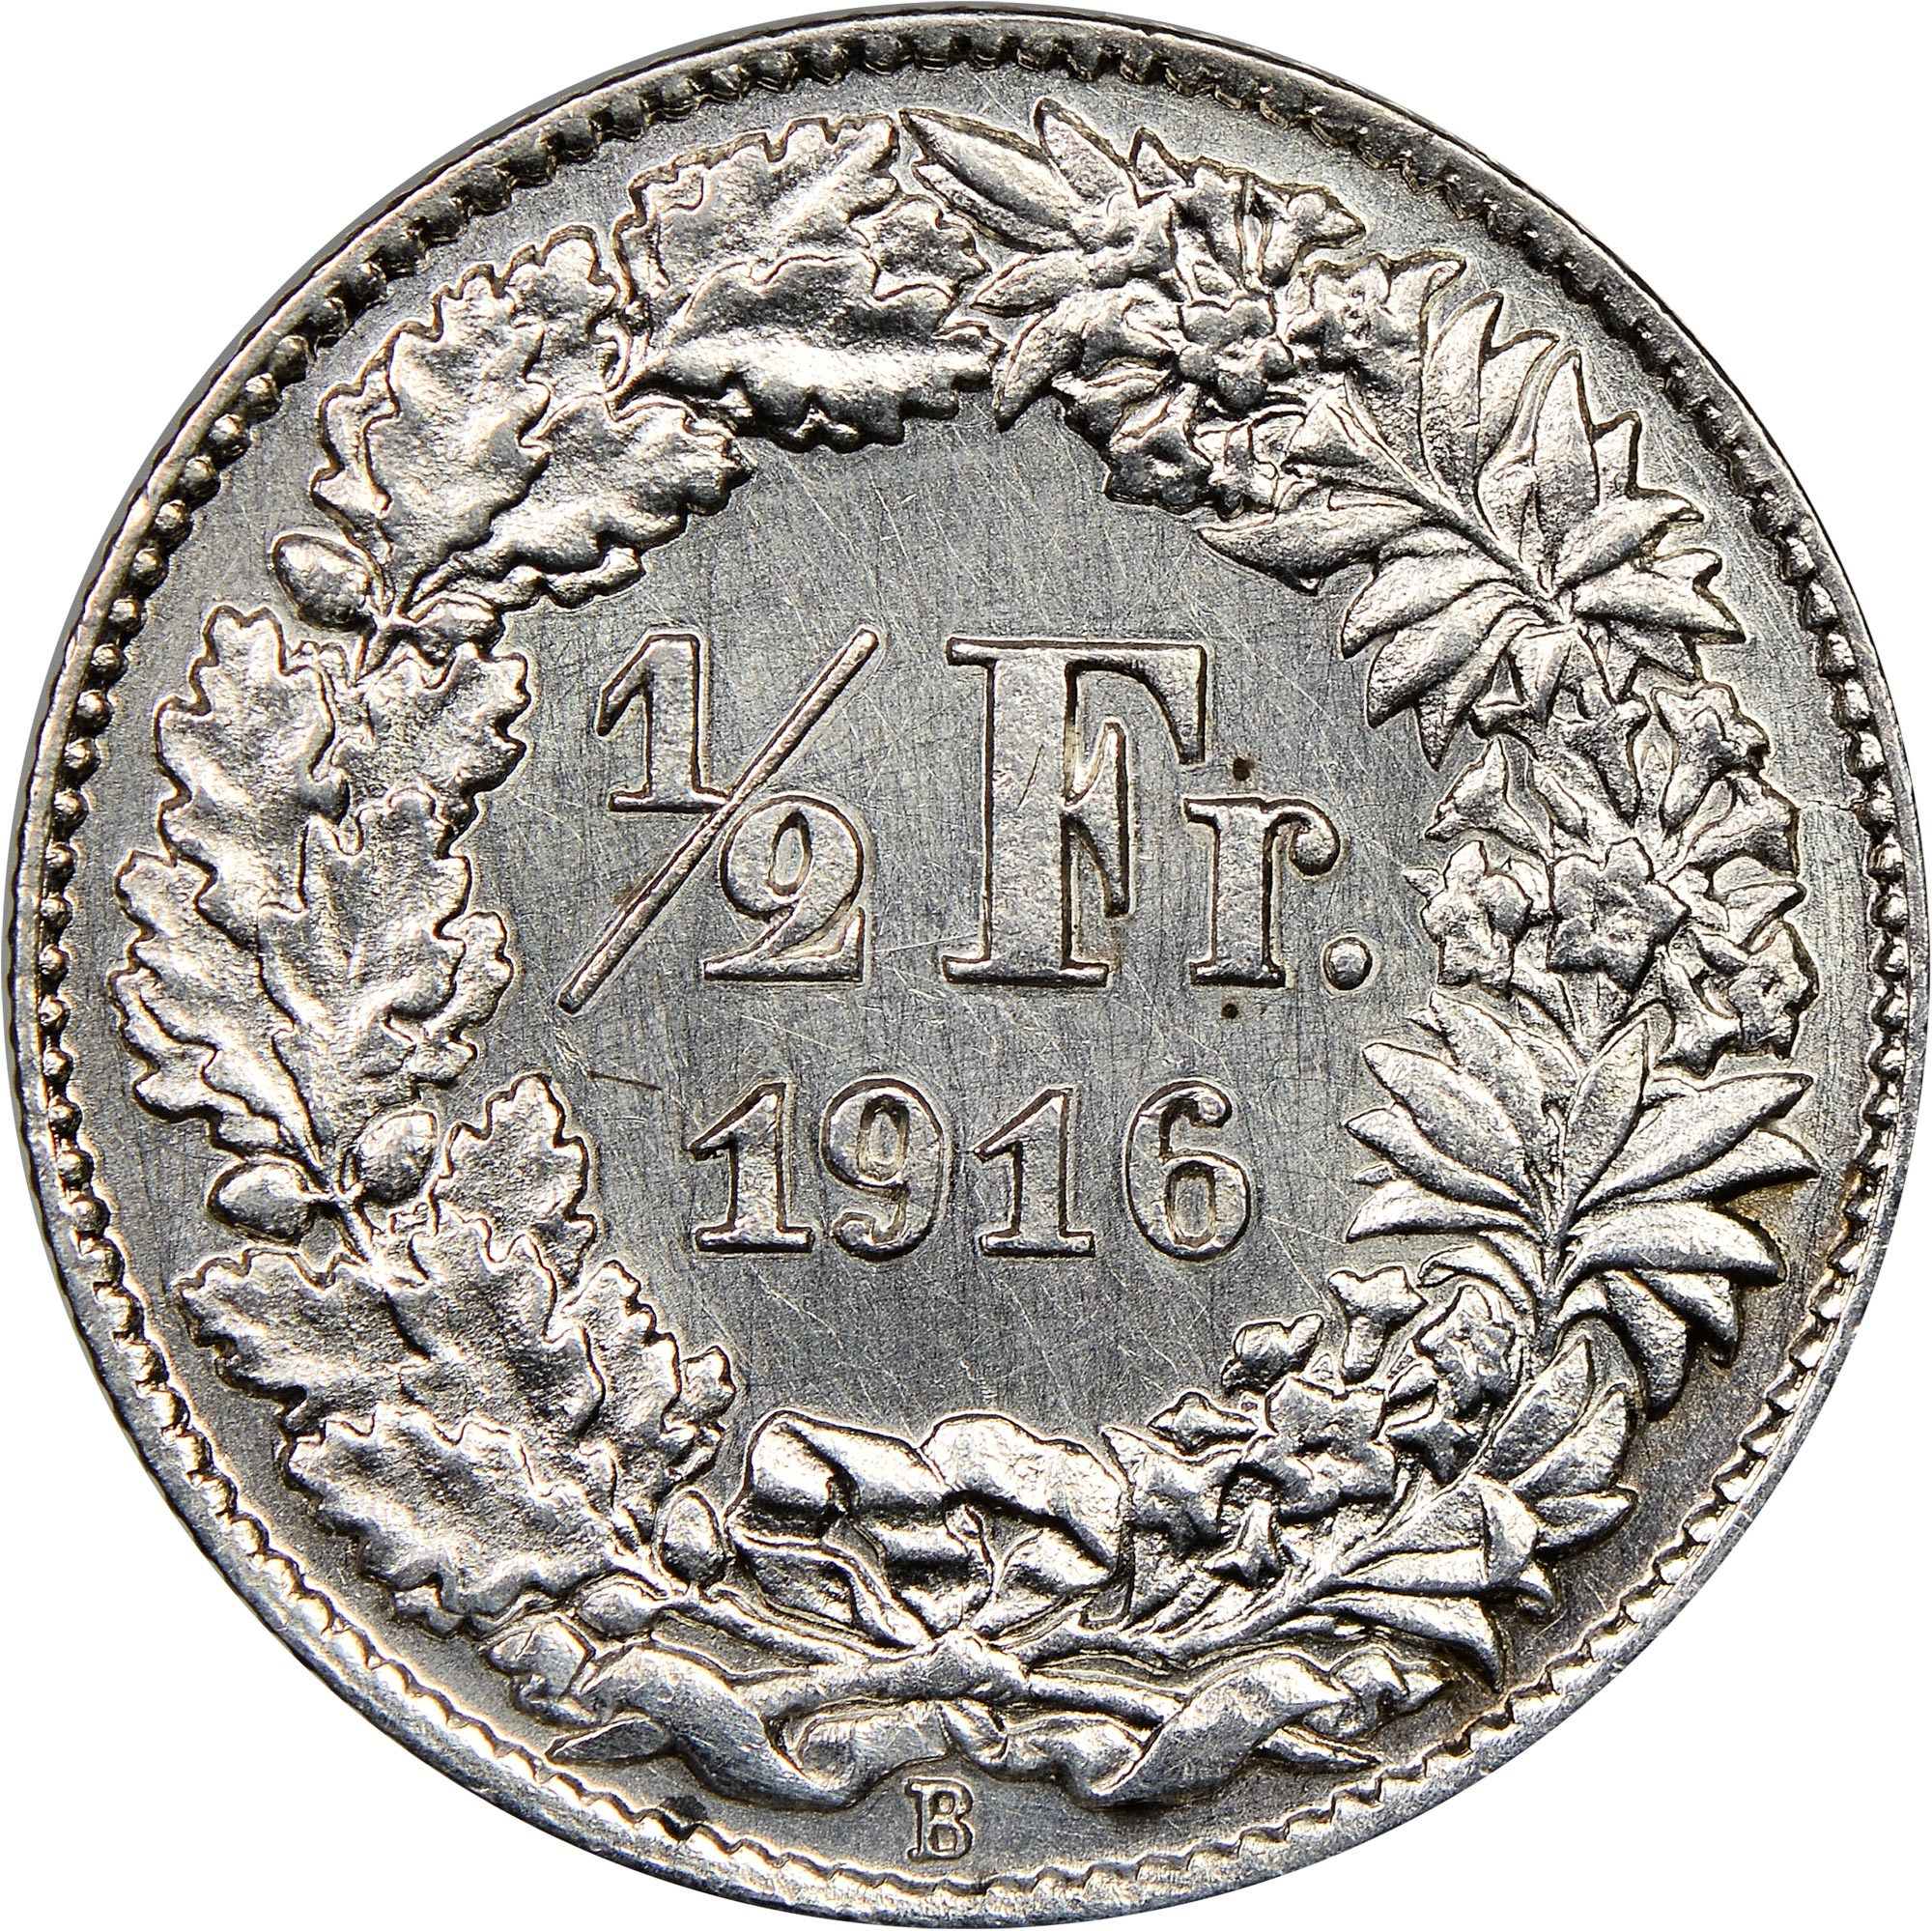 Switzerland 1/2 Franc reverse